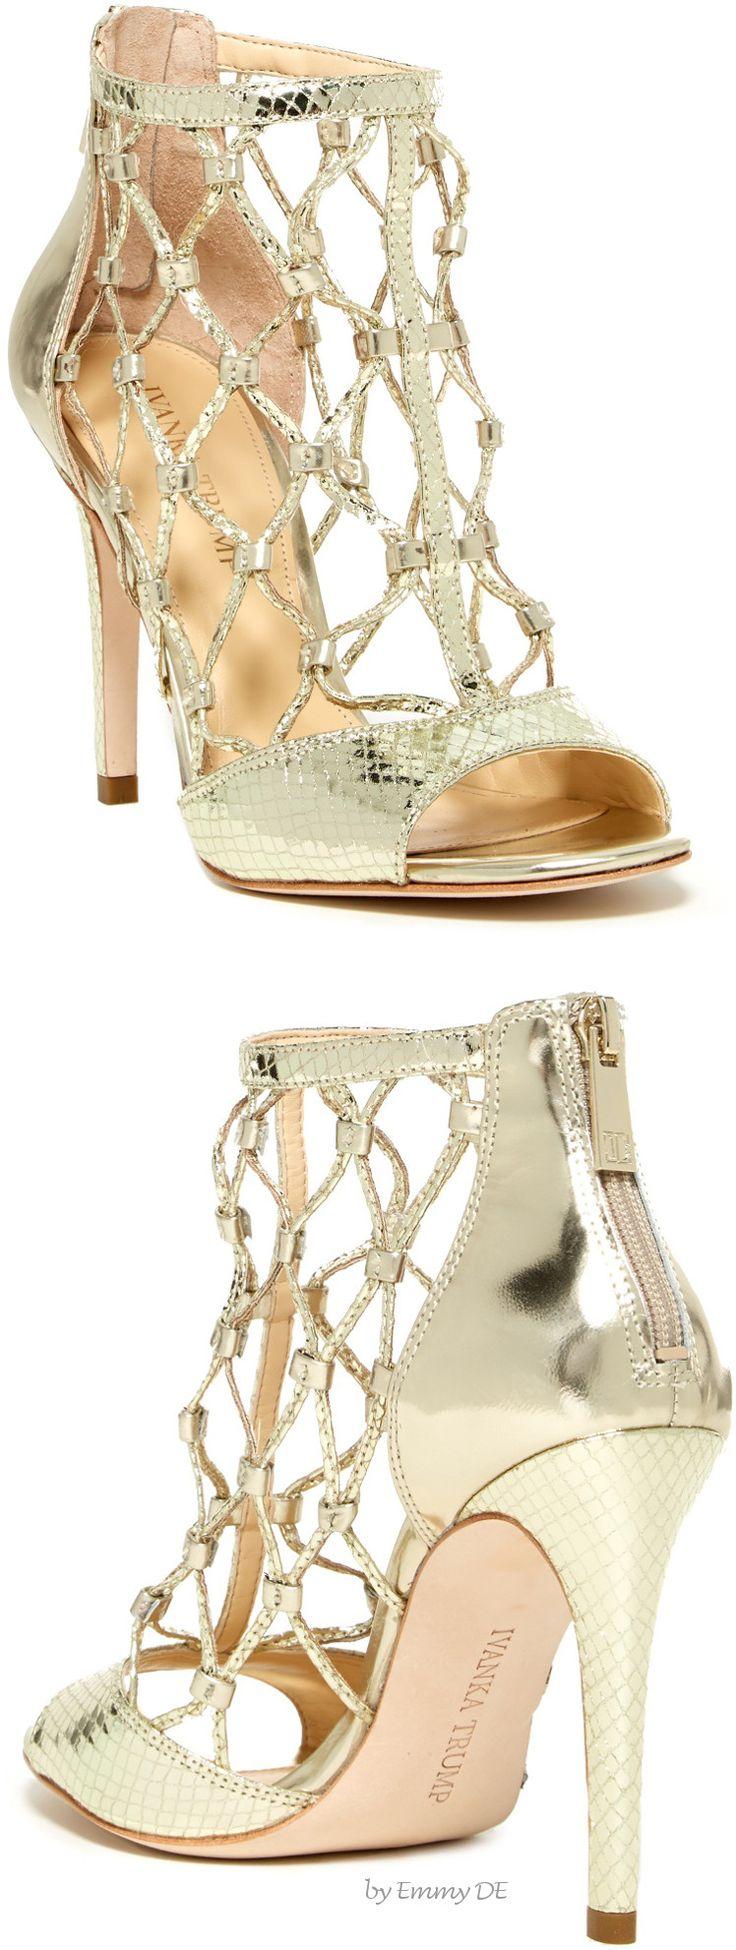 Emmy DE * Ivanka Trump Dalta Caged Dress Sandal